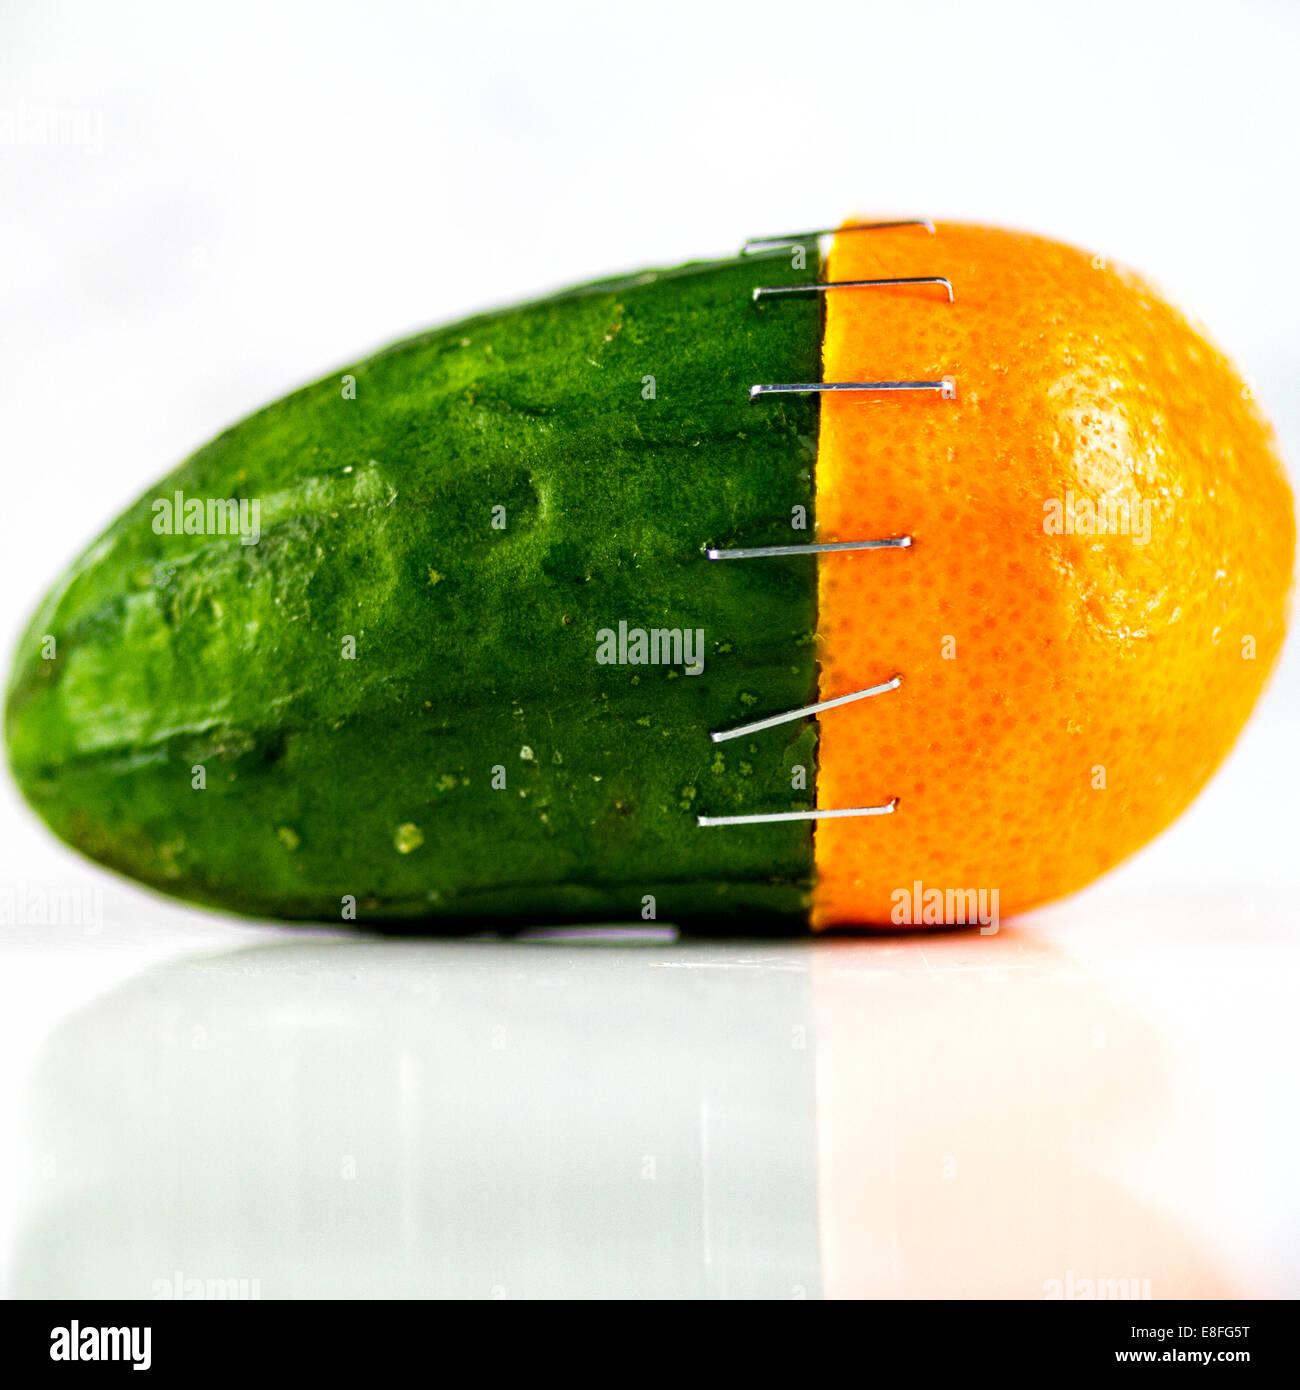 Naranja y pepino grapa Imagen De Stock